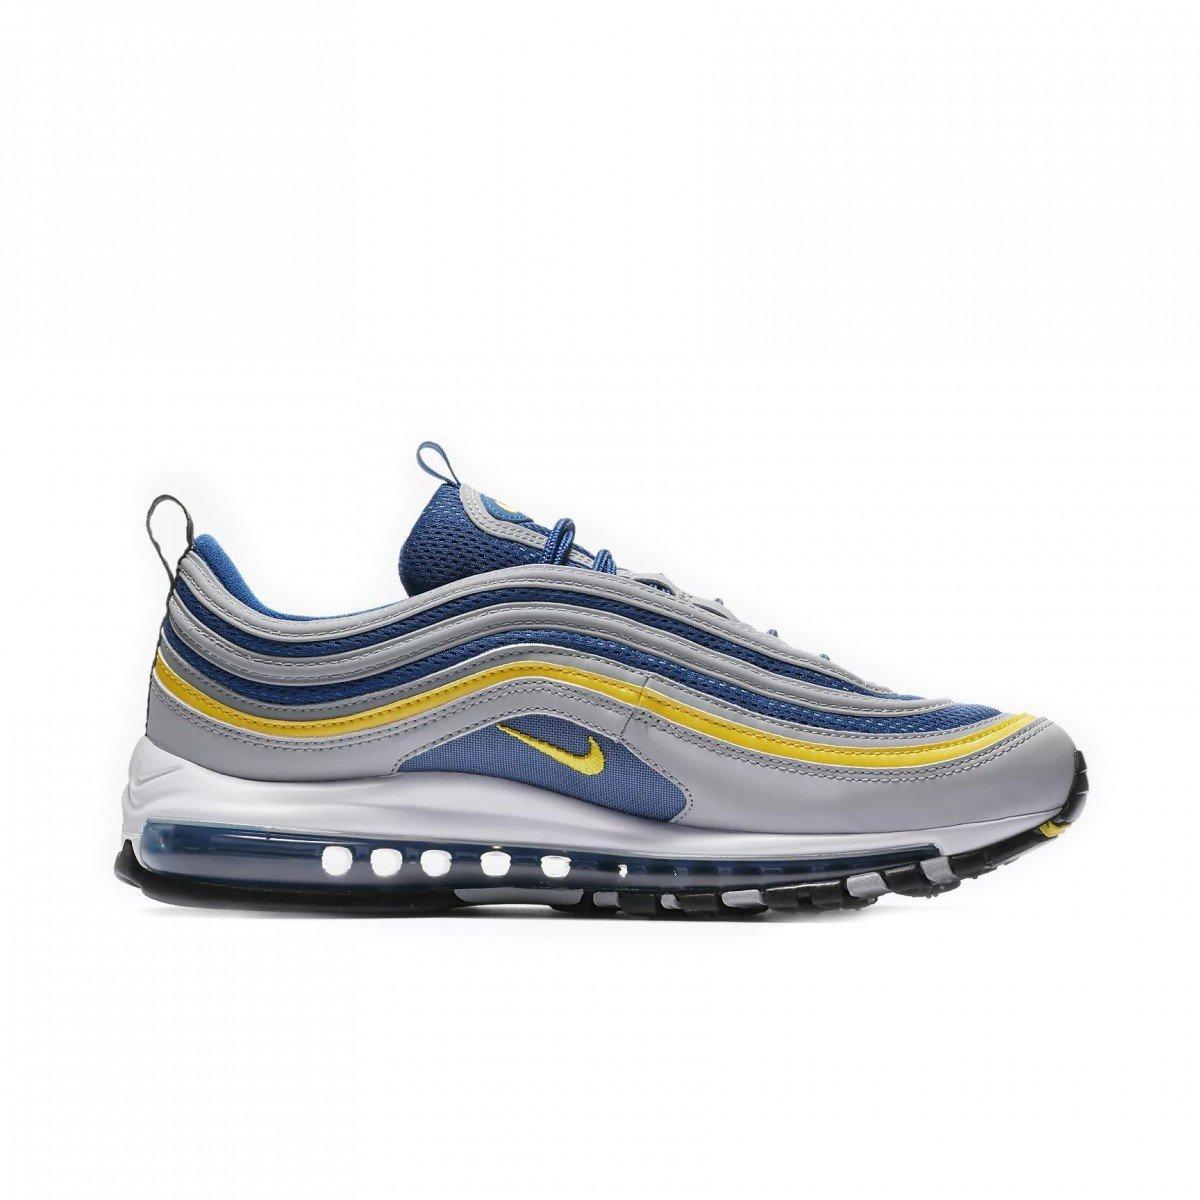 Nike Air Max 97 AM97  Michigan  Retro Schuhe Herren